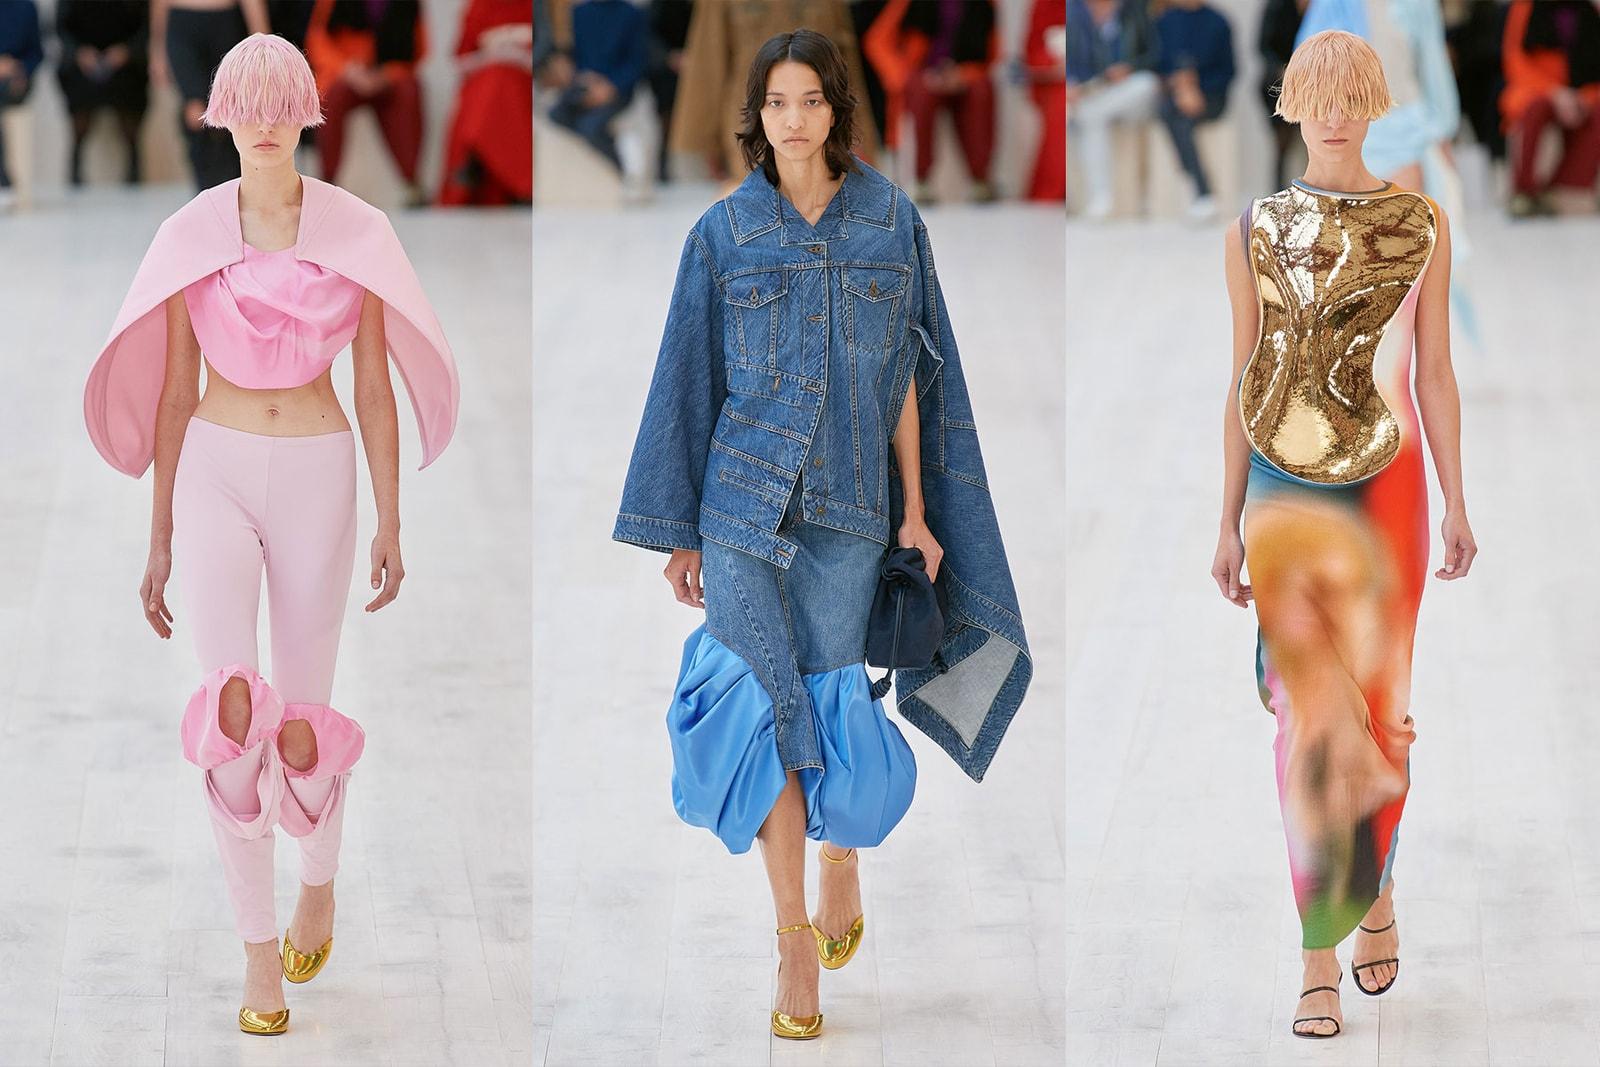 Paris Fashion Week Spring Summer 2022 SS22 Top Shows Trends Loewe Louis Vuitton Miu Miu Chanel